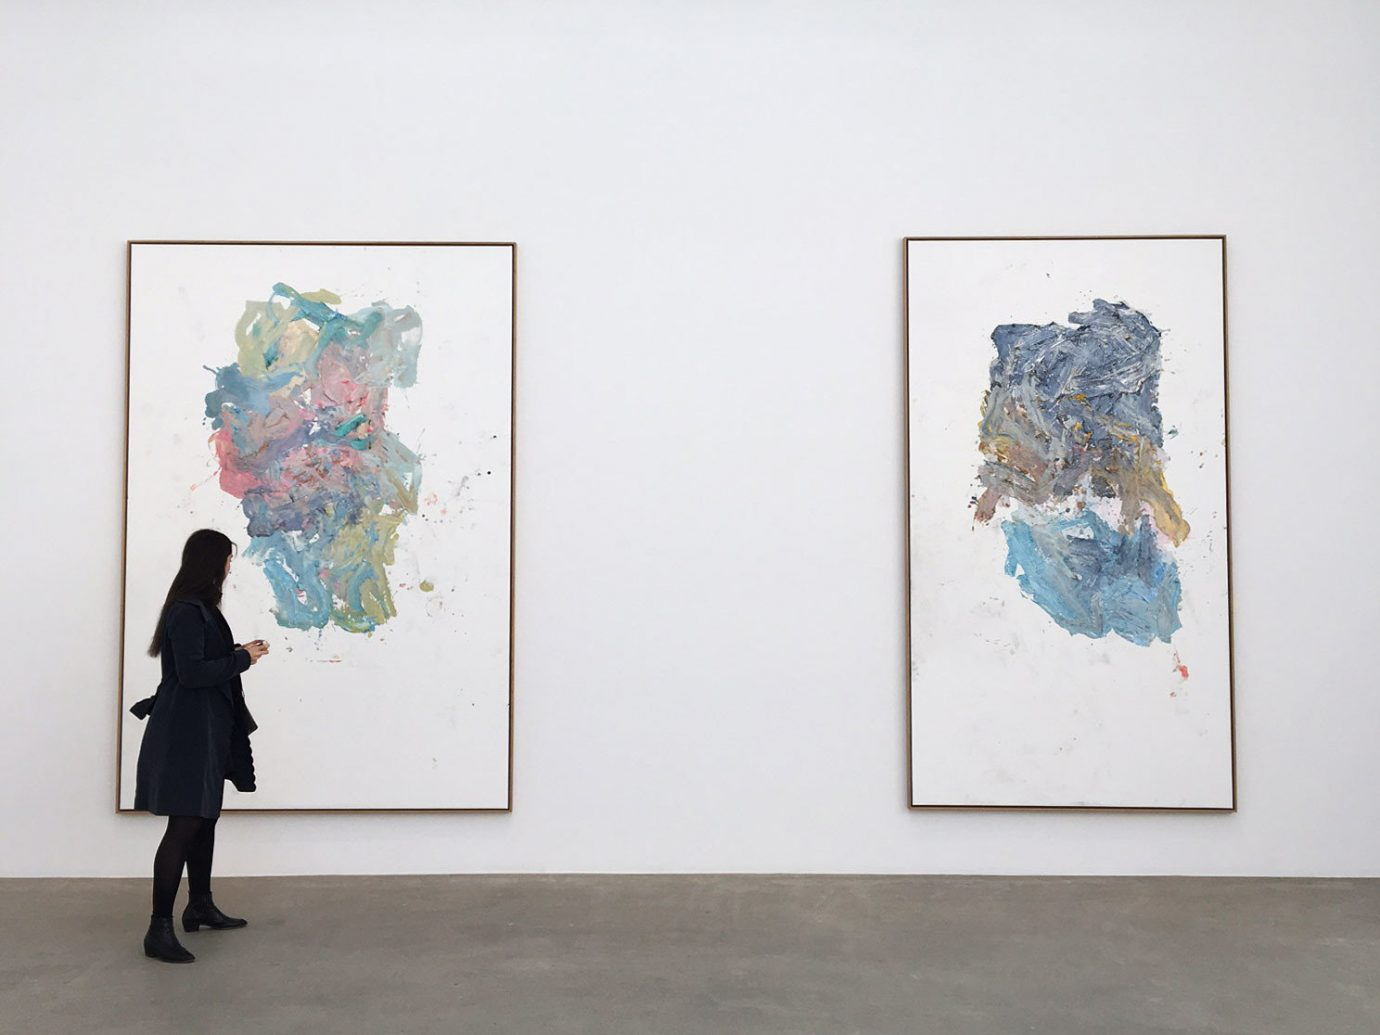 Paintings hanging in Galerie Thaddaeus Ropac